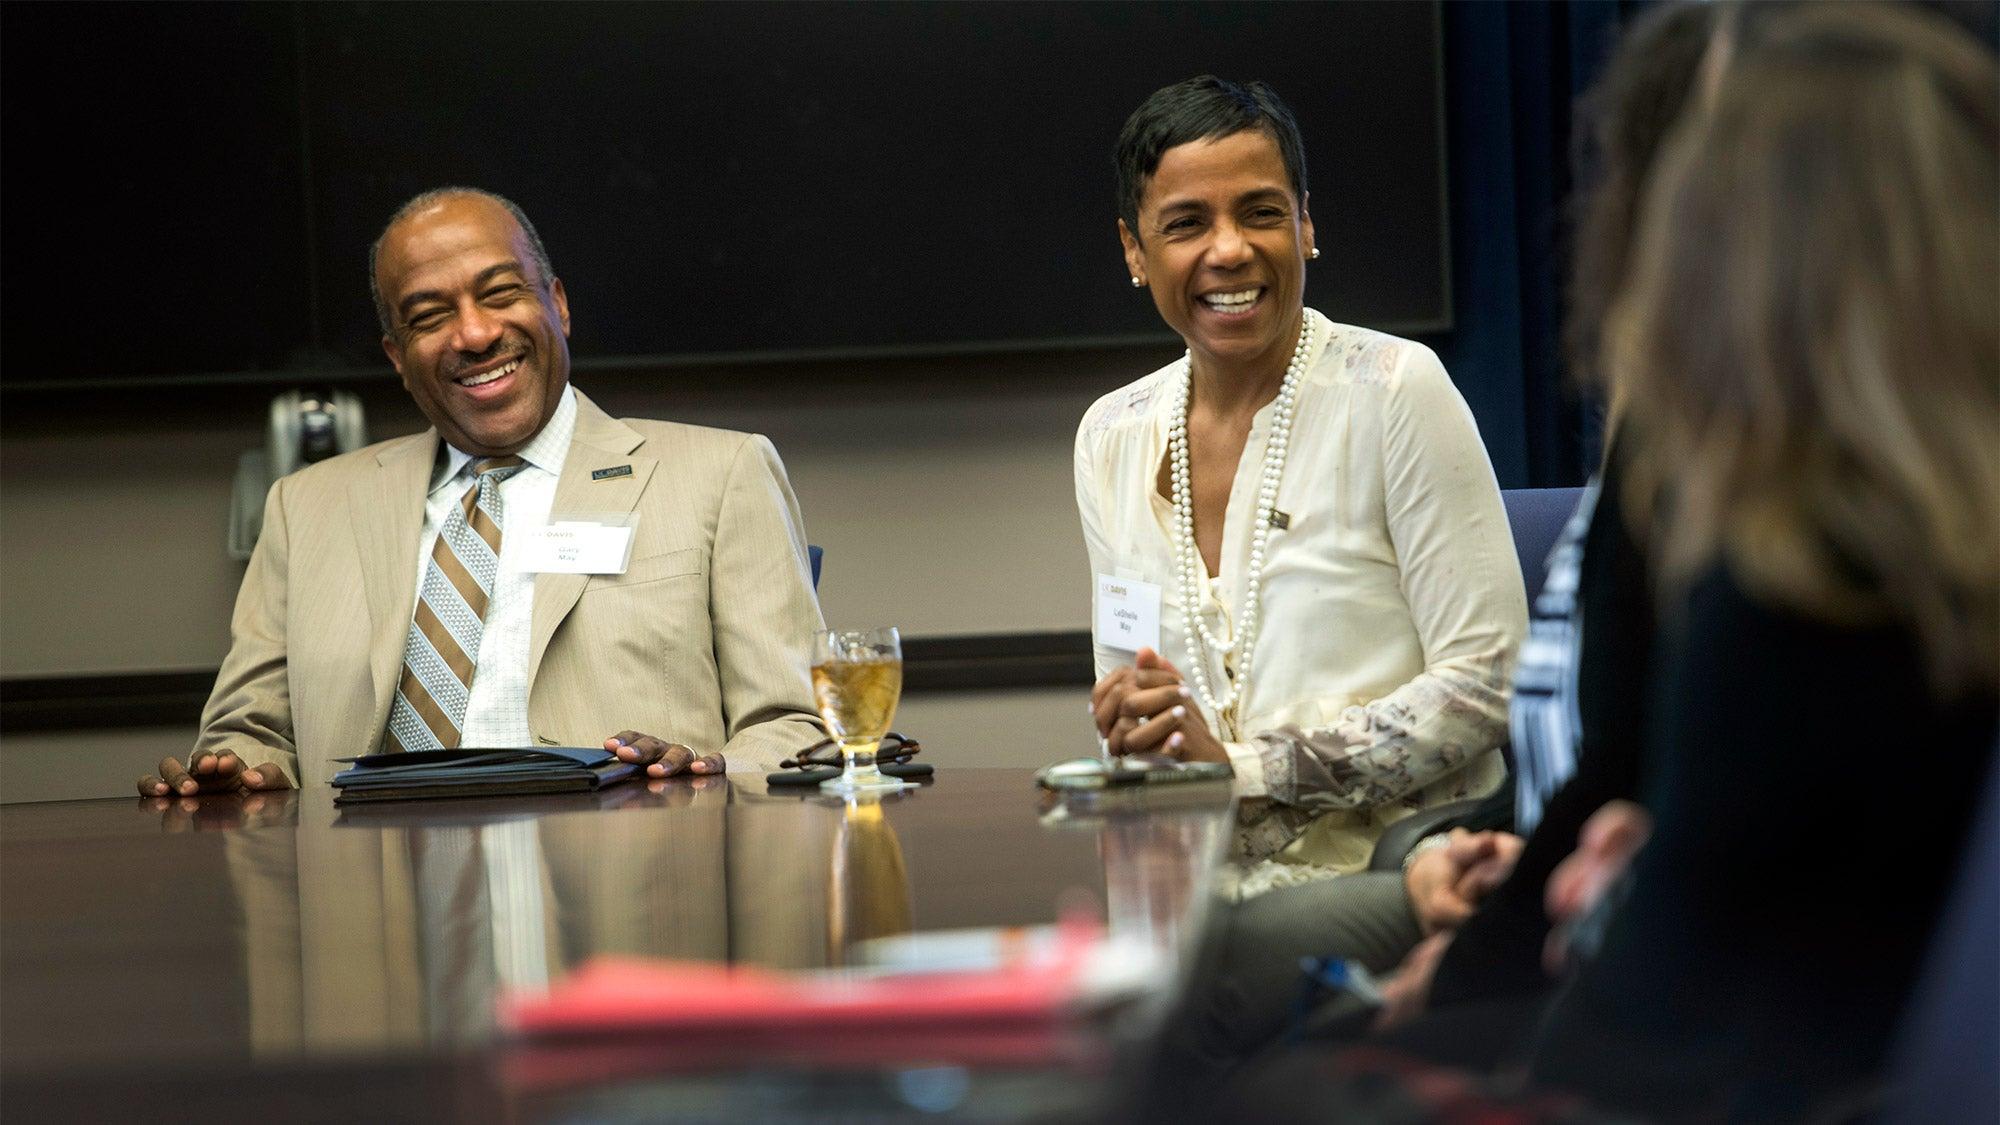 Gary S. May and LeShelle May at a meeting table.